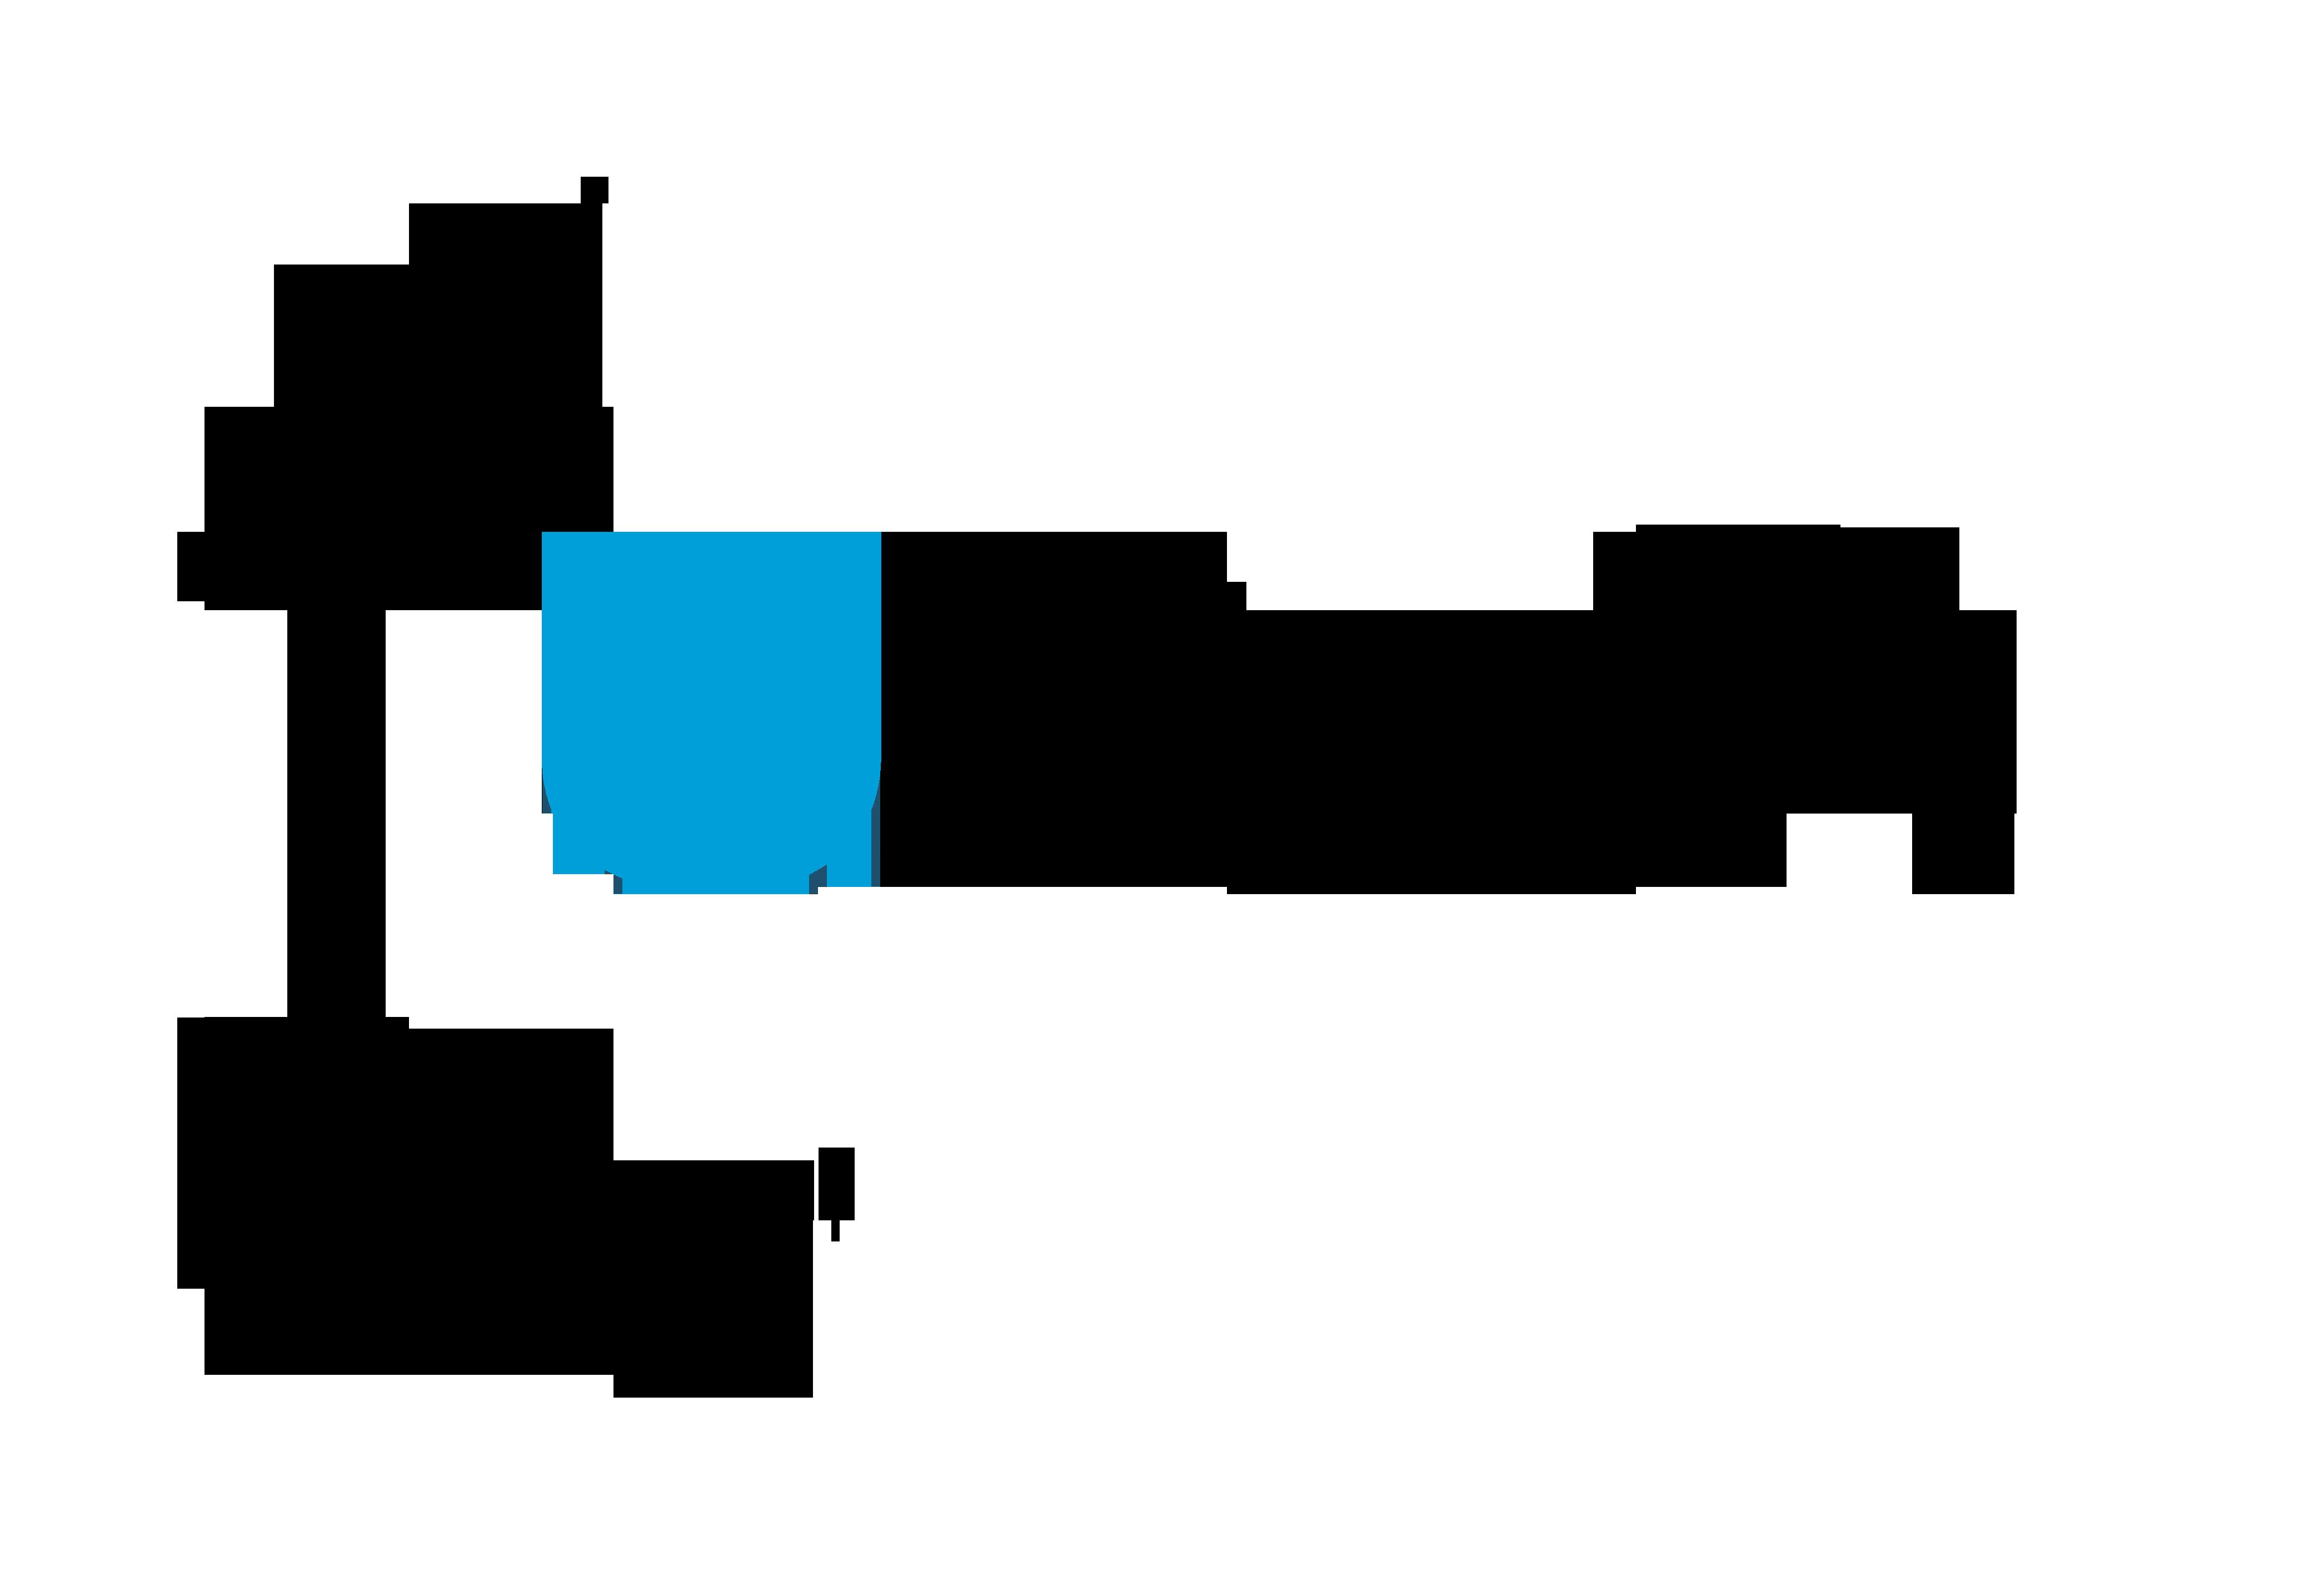 TUDelft-4electron